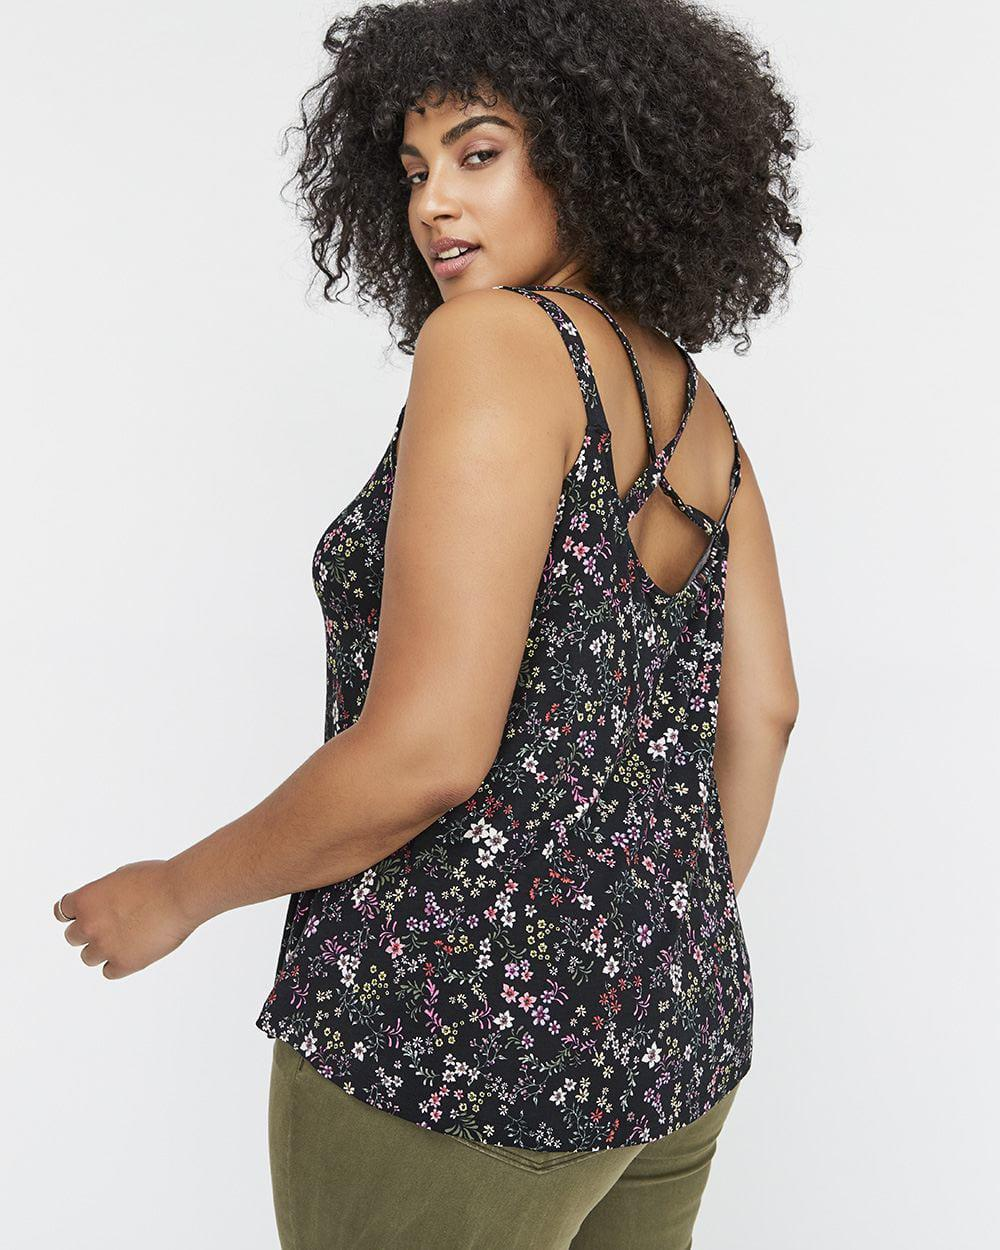 63196ca189804 Lyst - Addition Elle Michel Studio Crochet Lace Neckline Printed Camisole  in Black